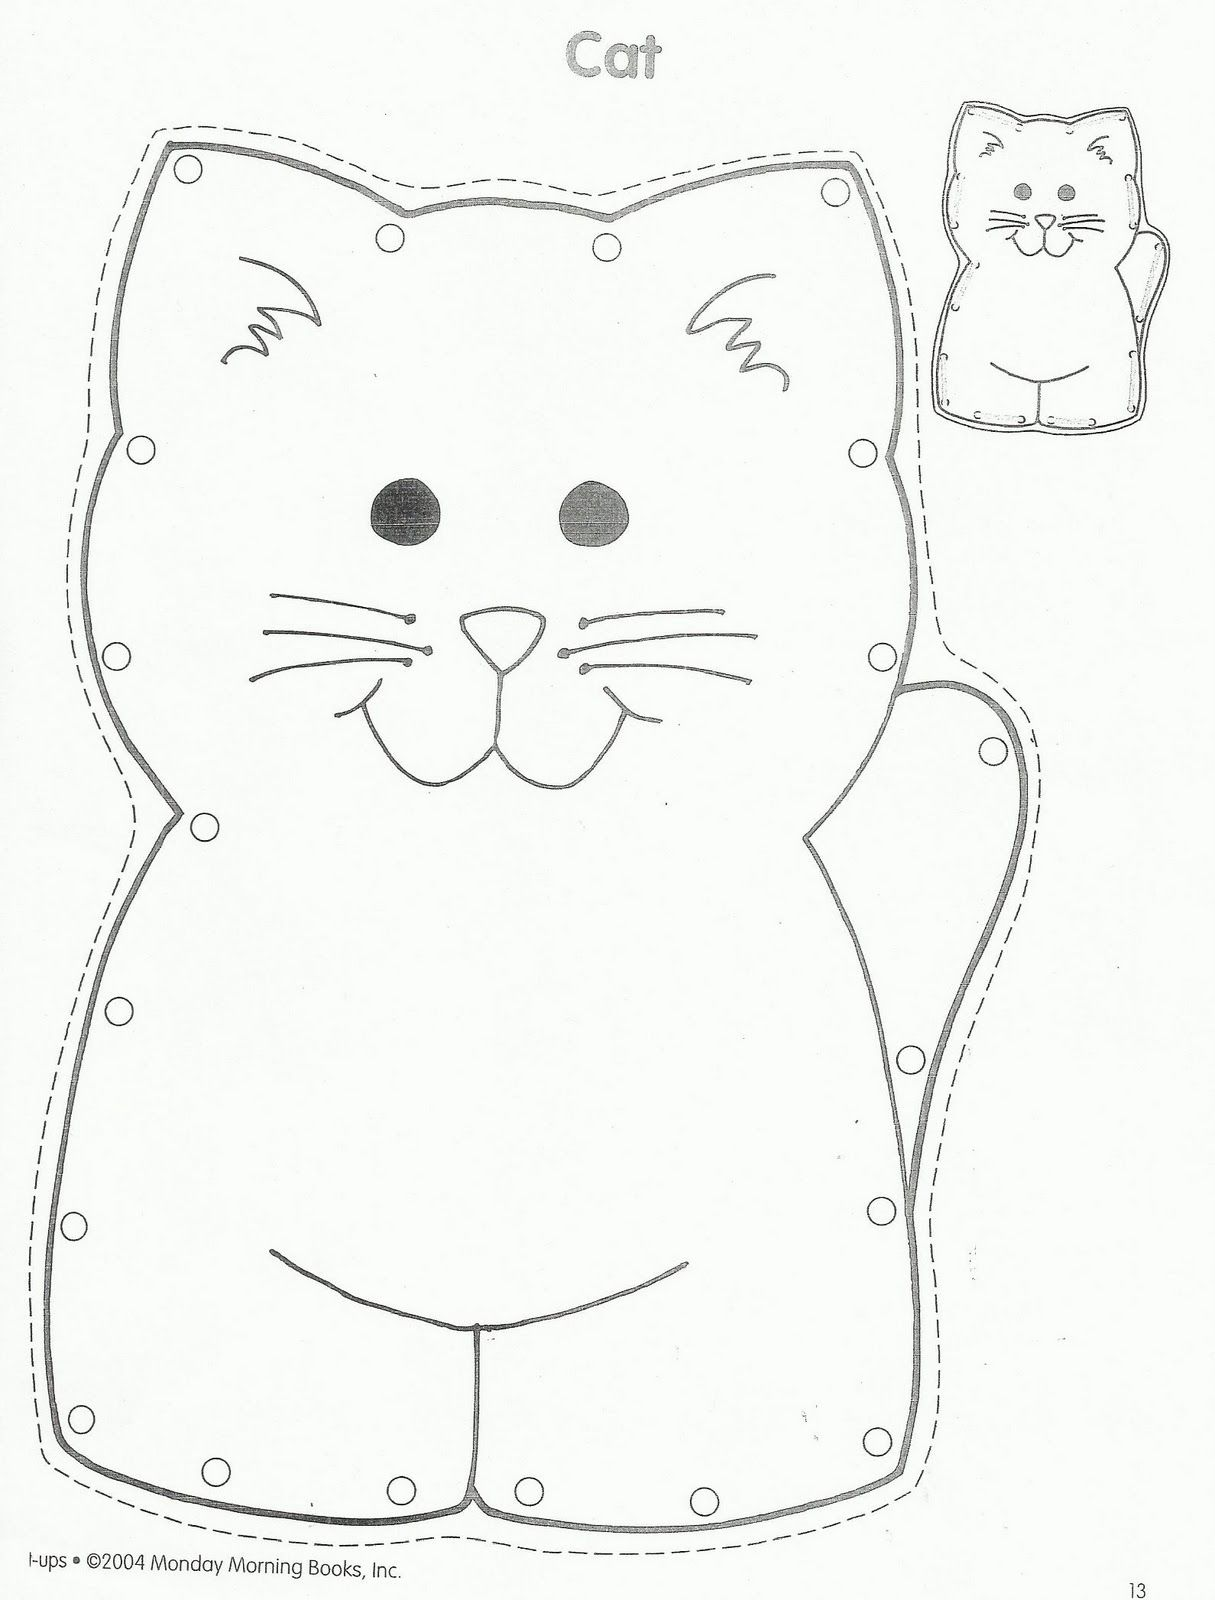 Squish Preschool Ideas Have Children Color Cat And Then